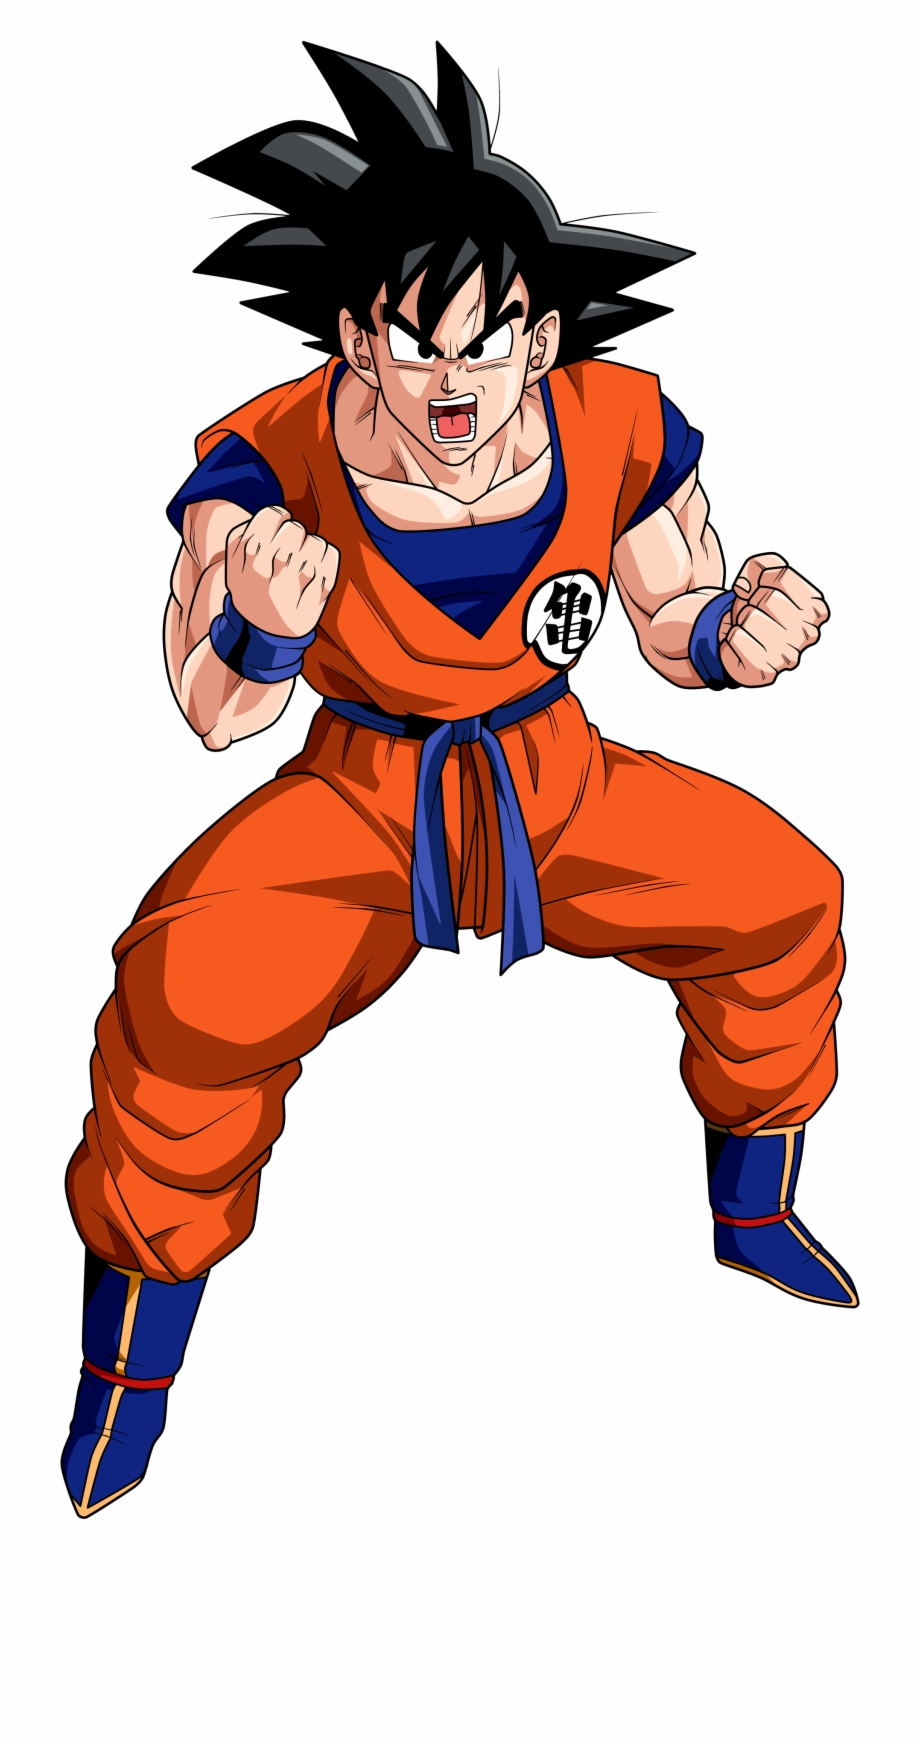 Dragon Ball Z Clipart Png Transparent - Dragon Ball Z Goku ... clipart royalty free library